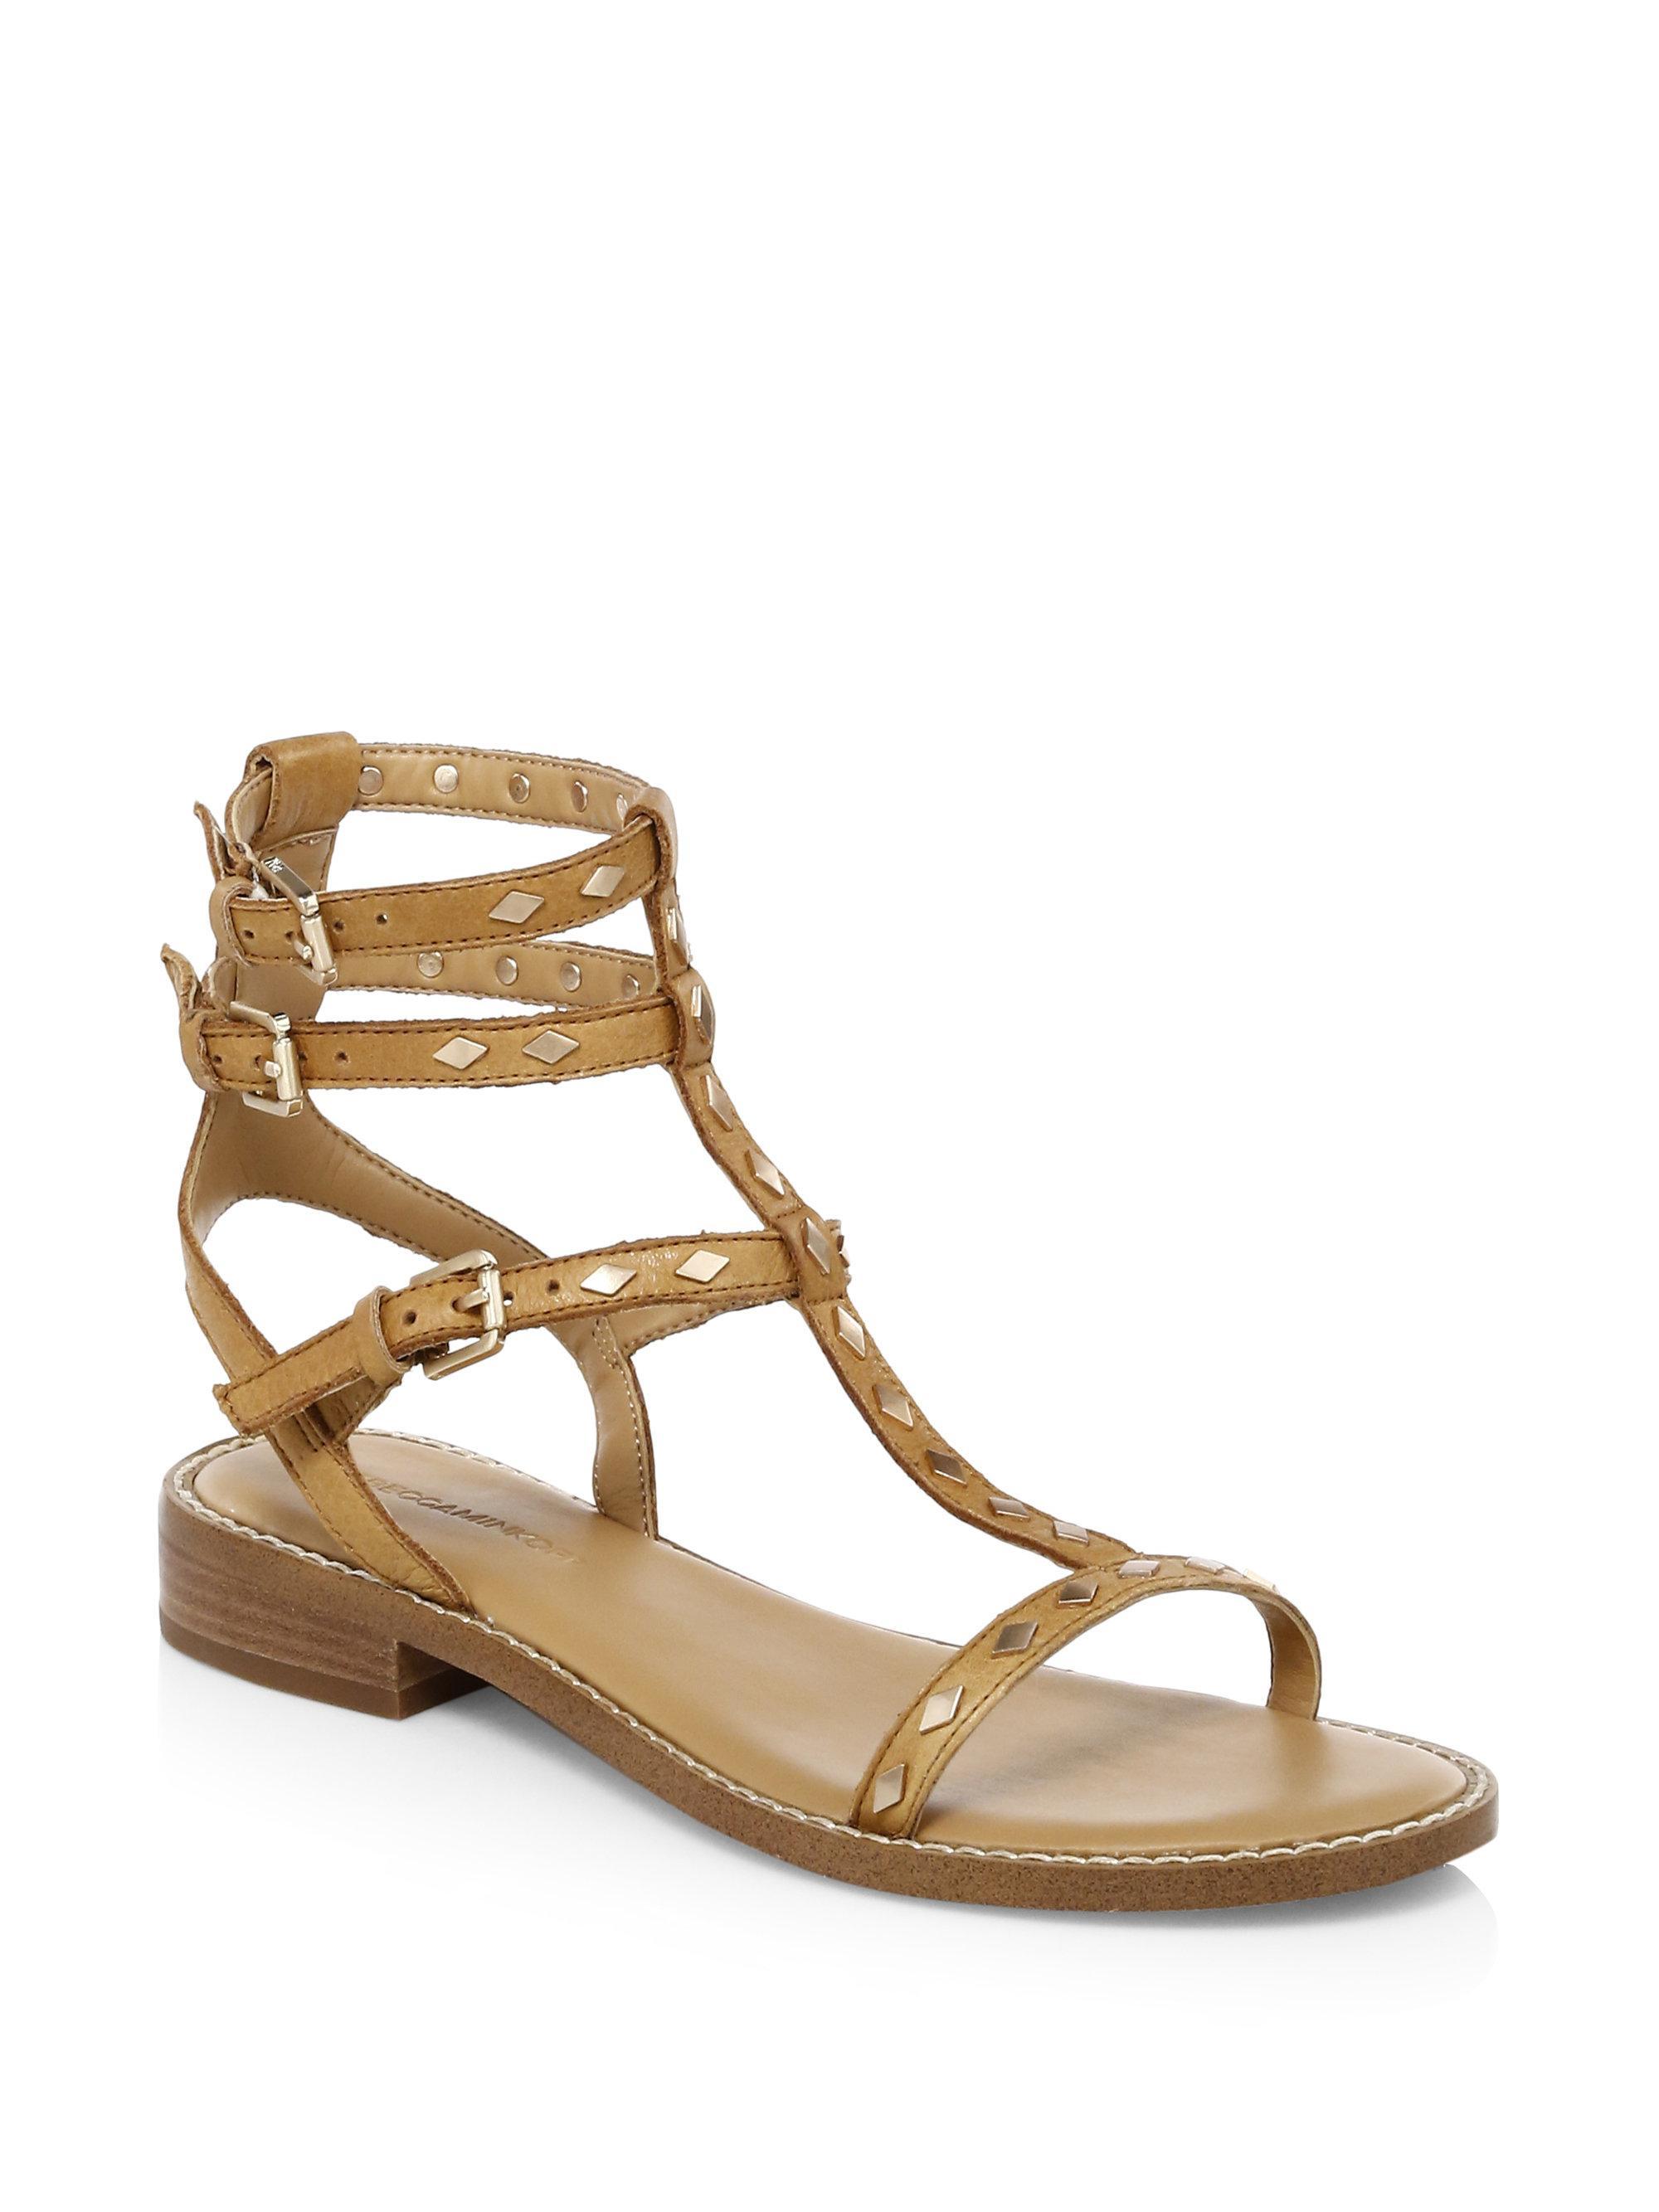 Rebecca Minkoff Arella Studded Gladiator Sandals kTAzOo